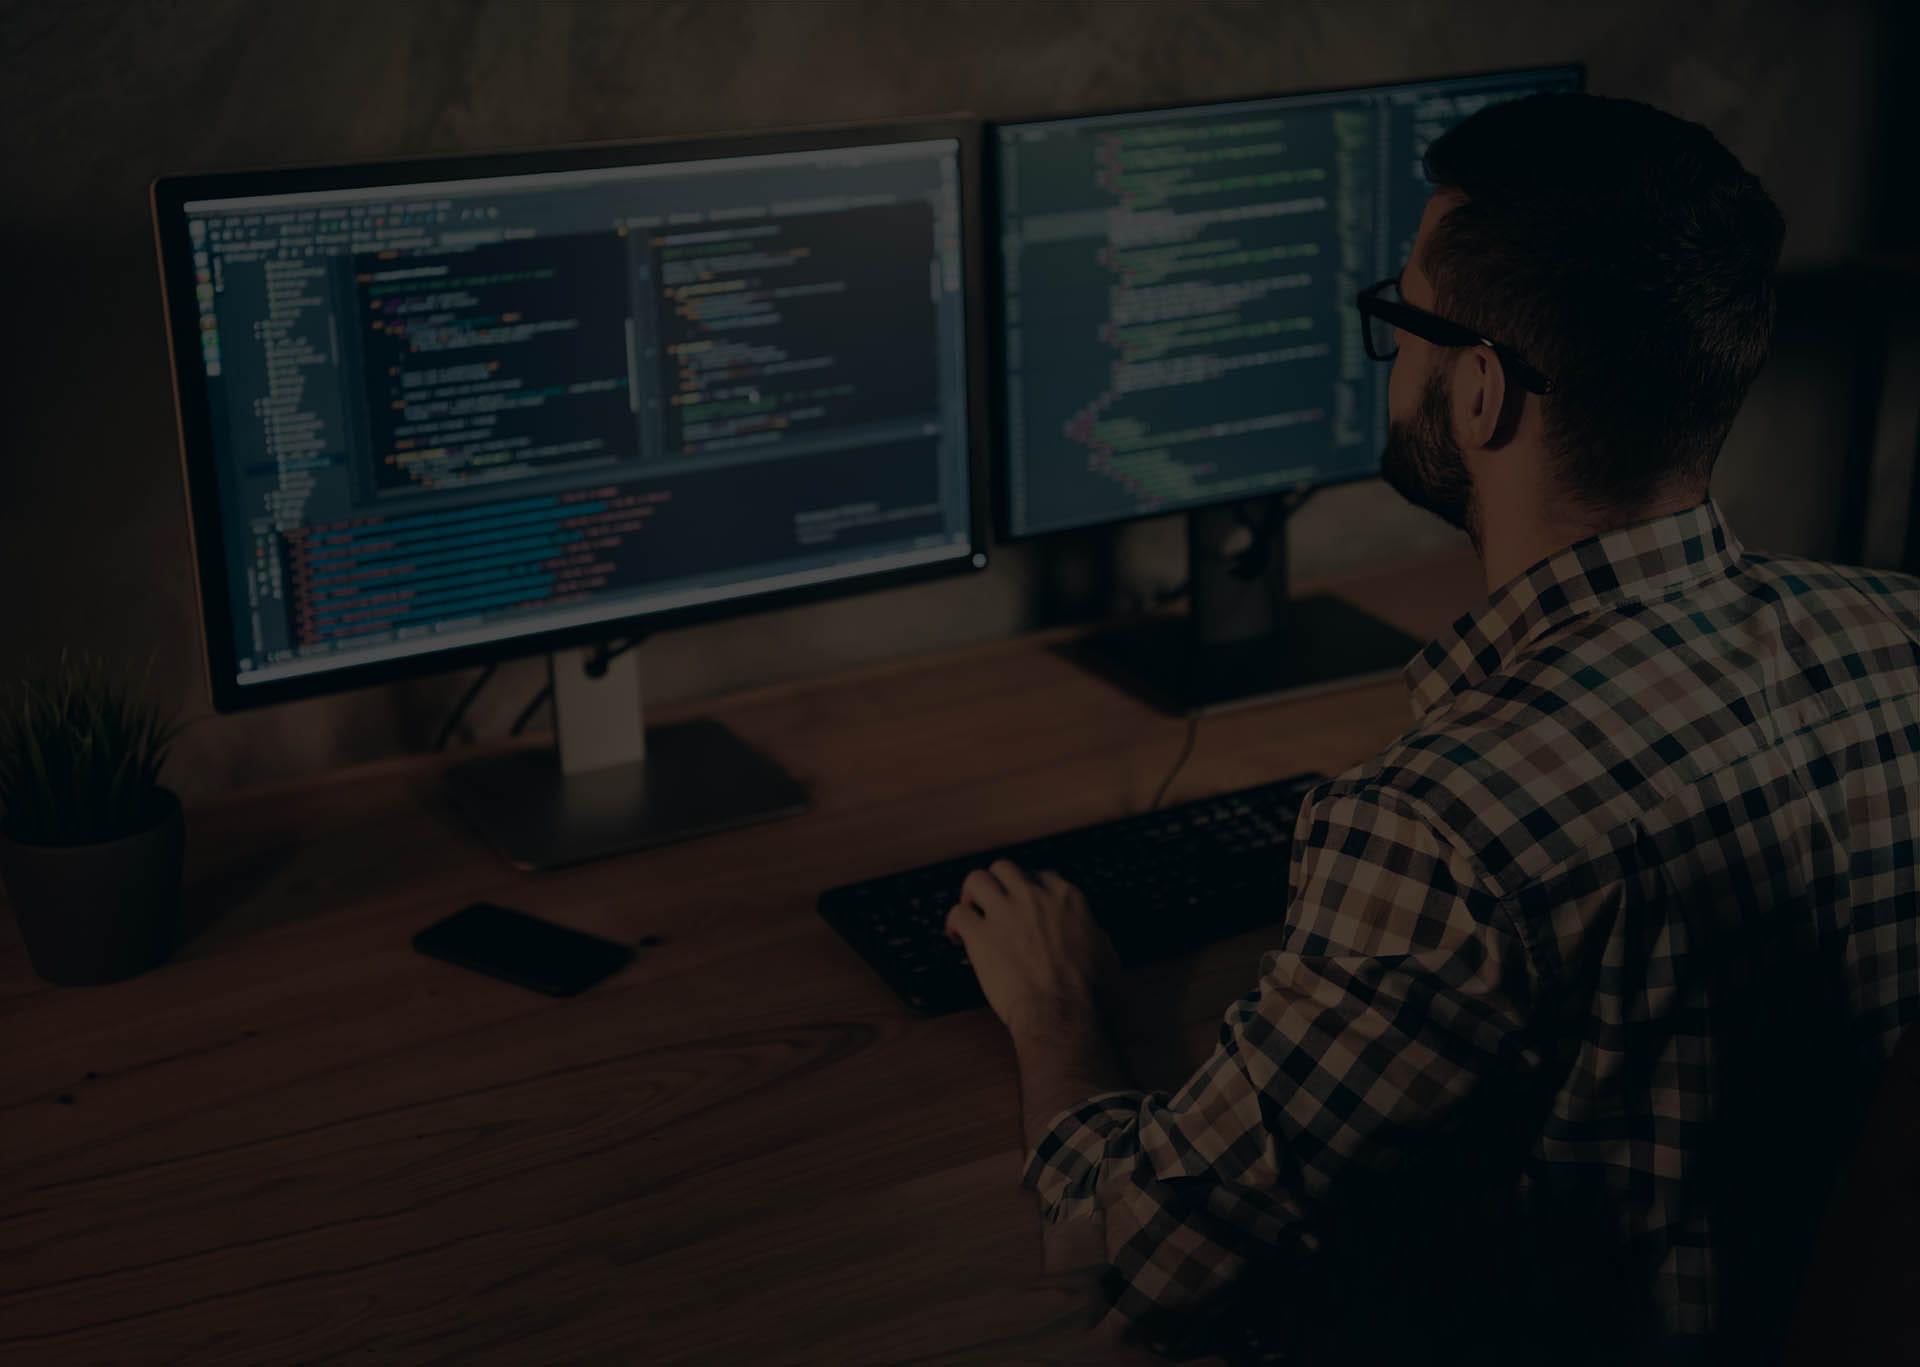 Header - Long-term Collaboration with a Sitecore Partner - Case Study Brimit